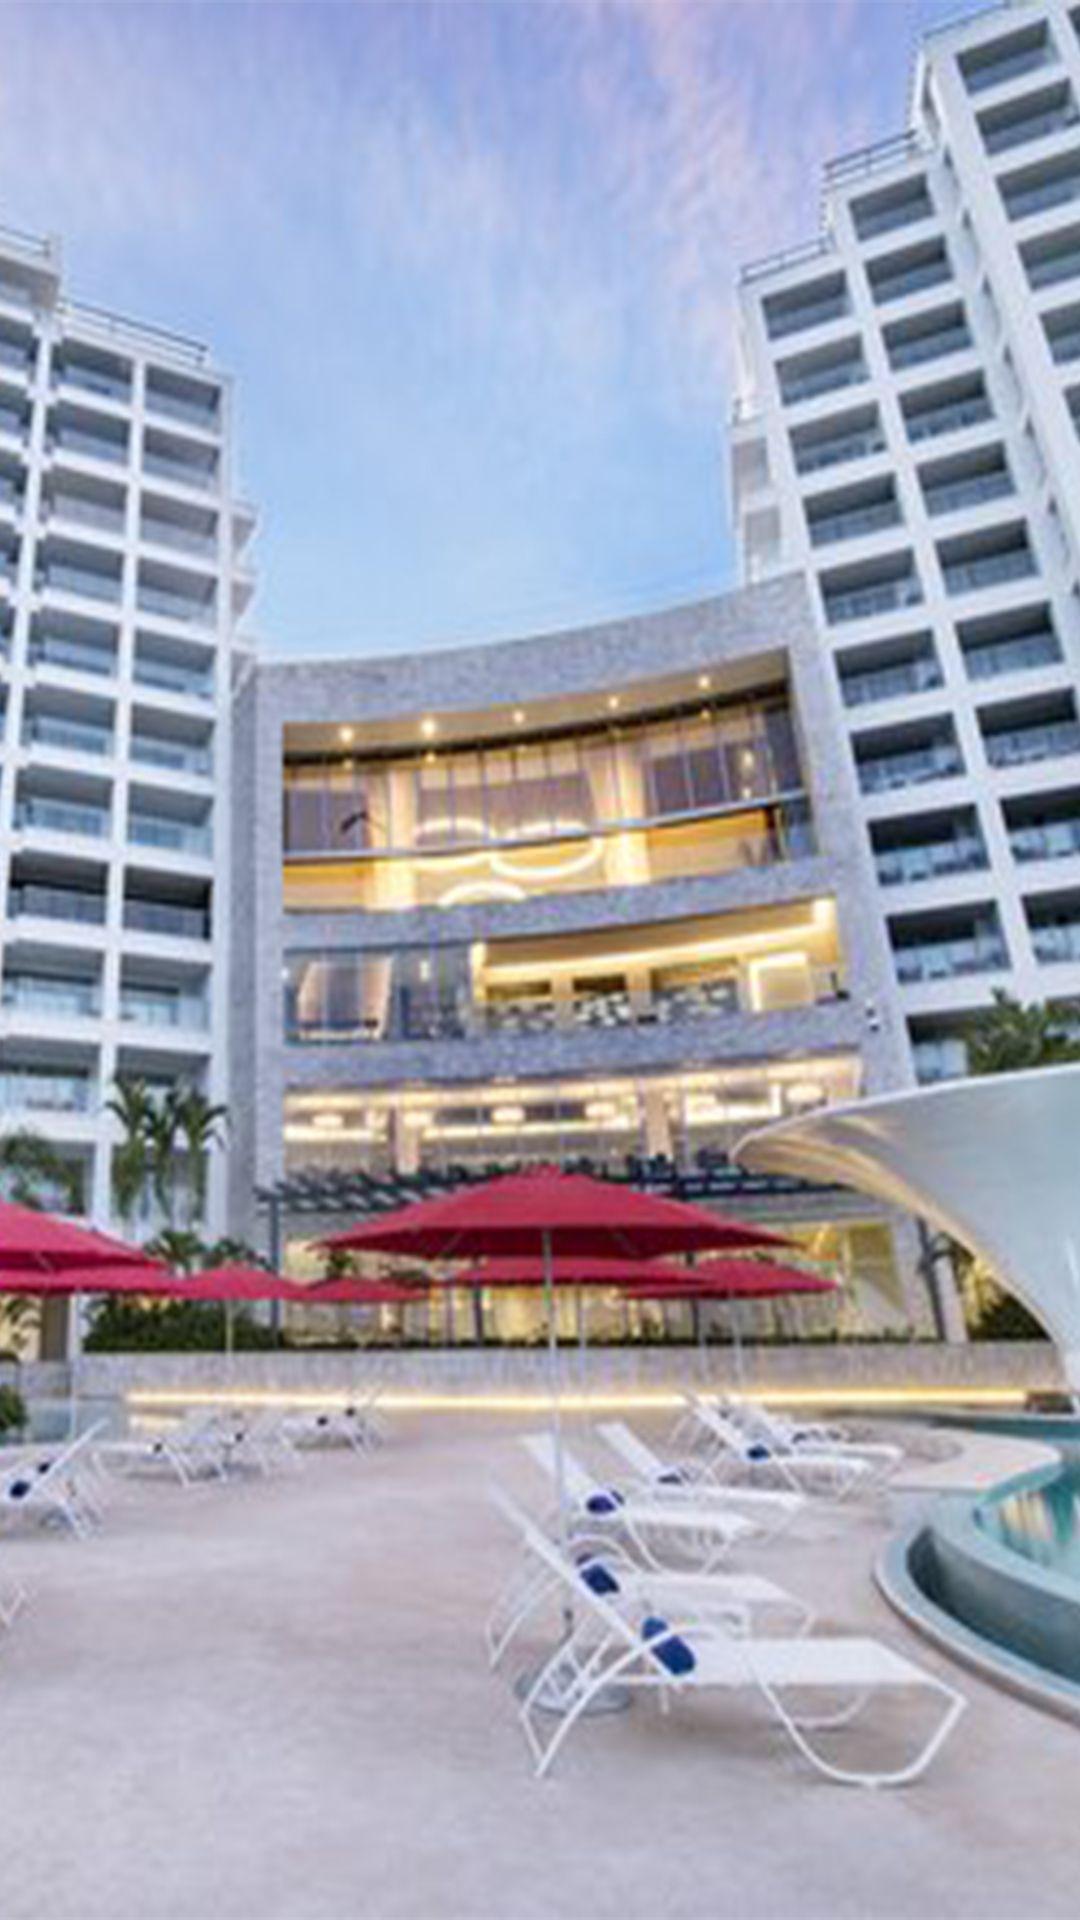 Pin On Top Ten All-Inclusive Puerto Vallarta Resorts